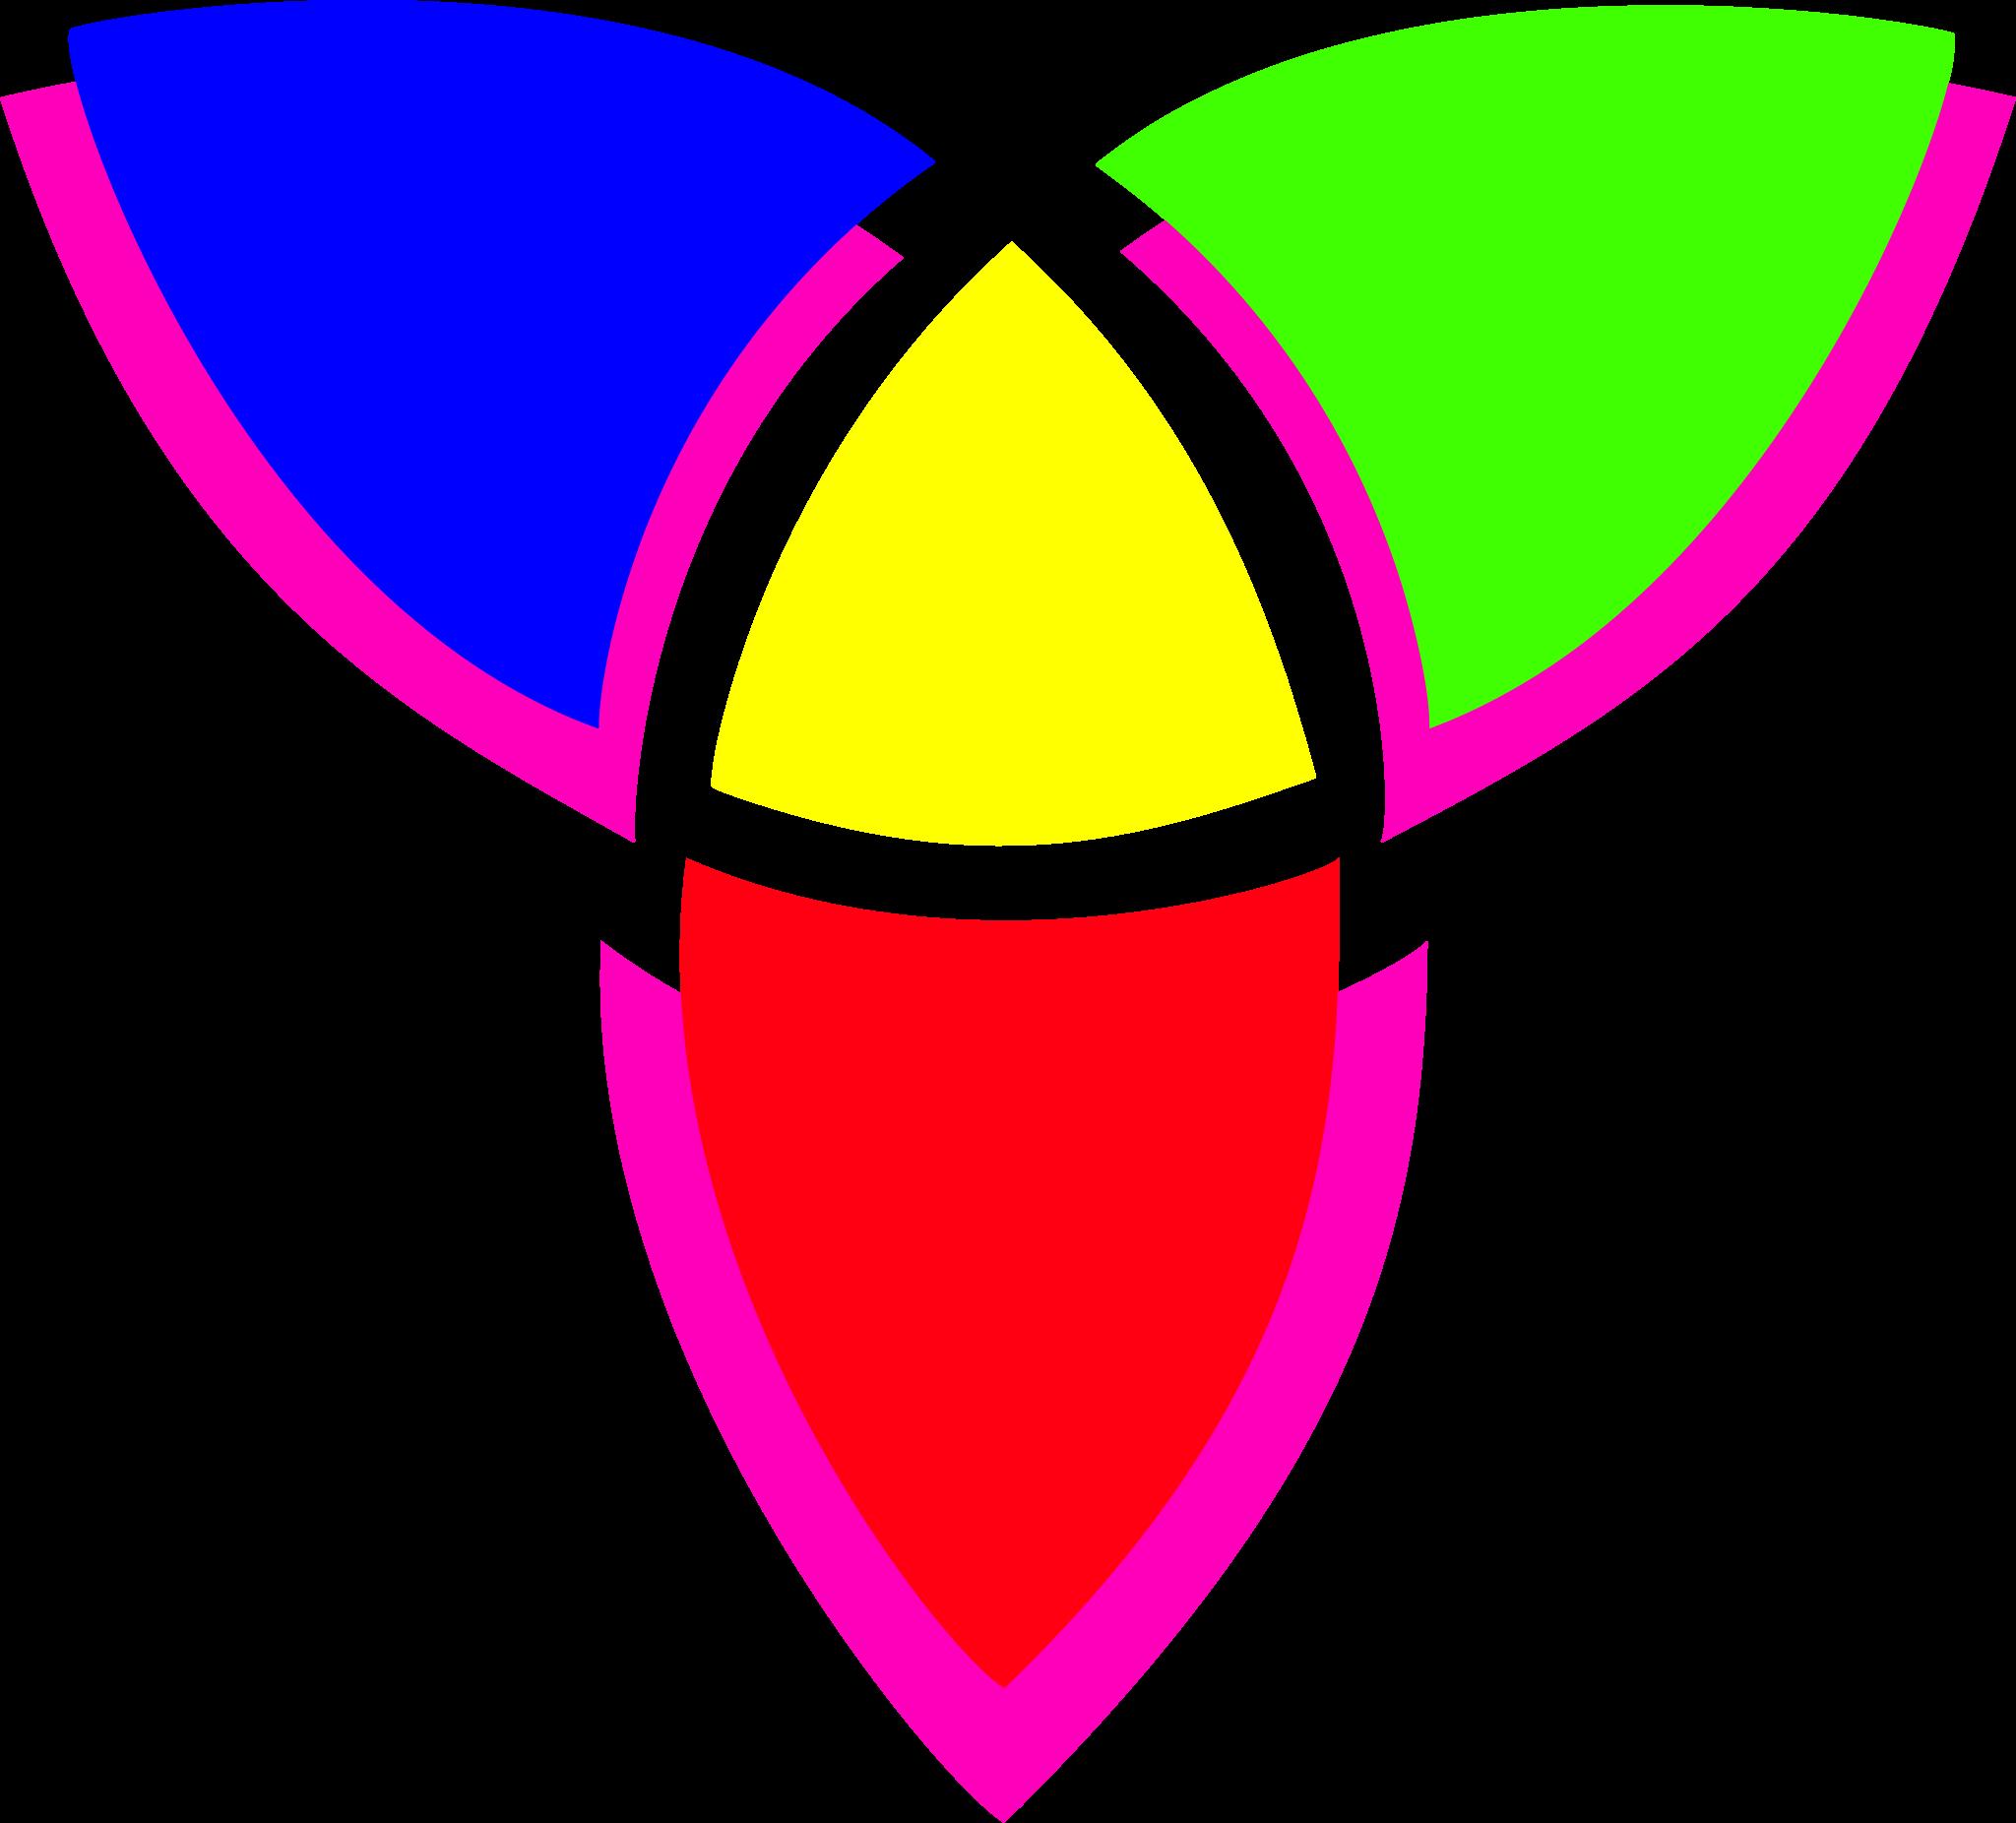 TI_Trinity007 2048.png